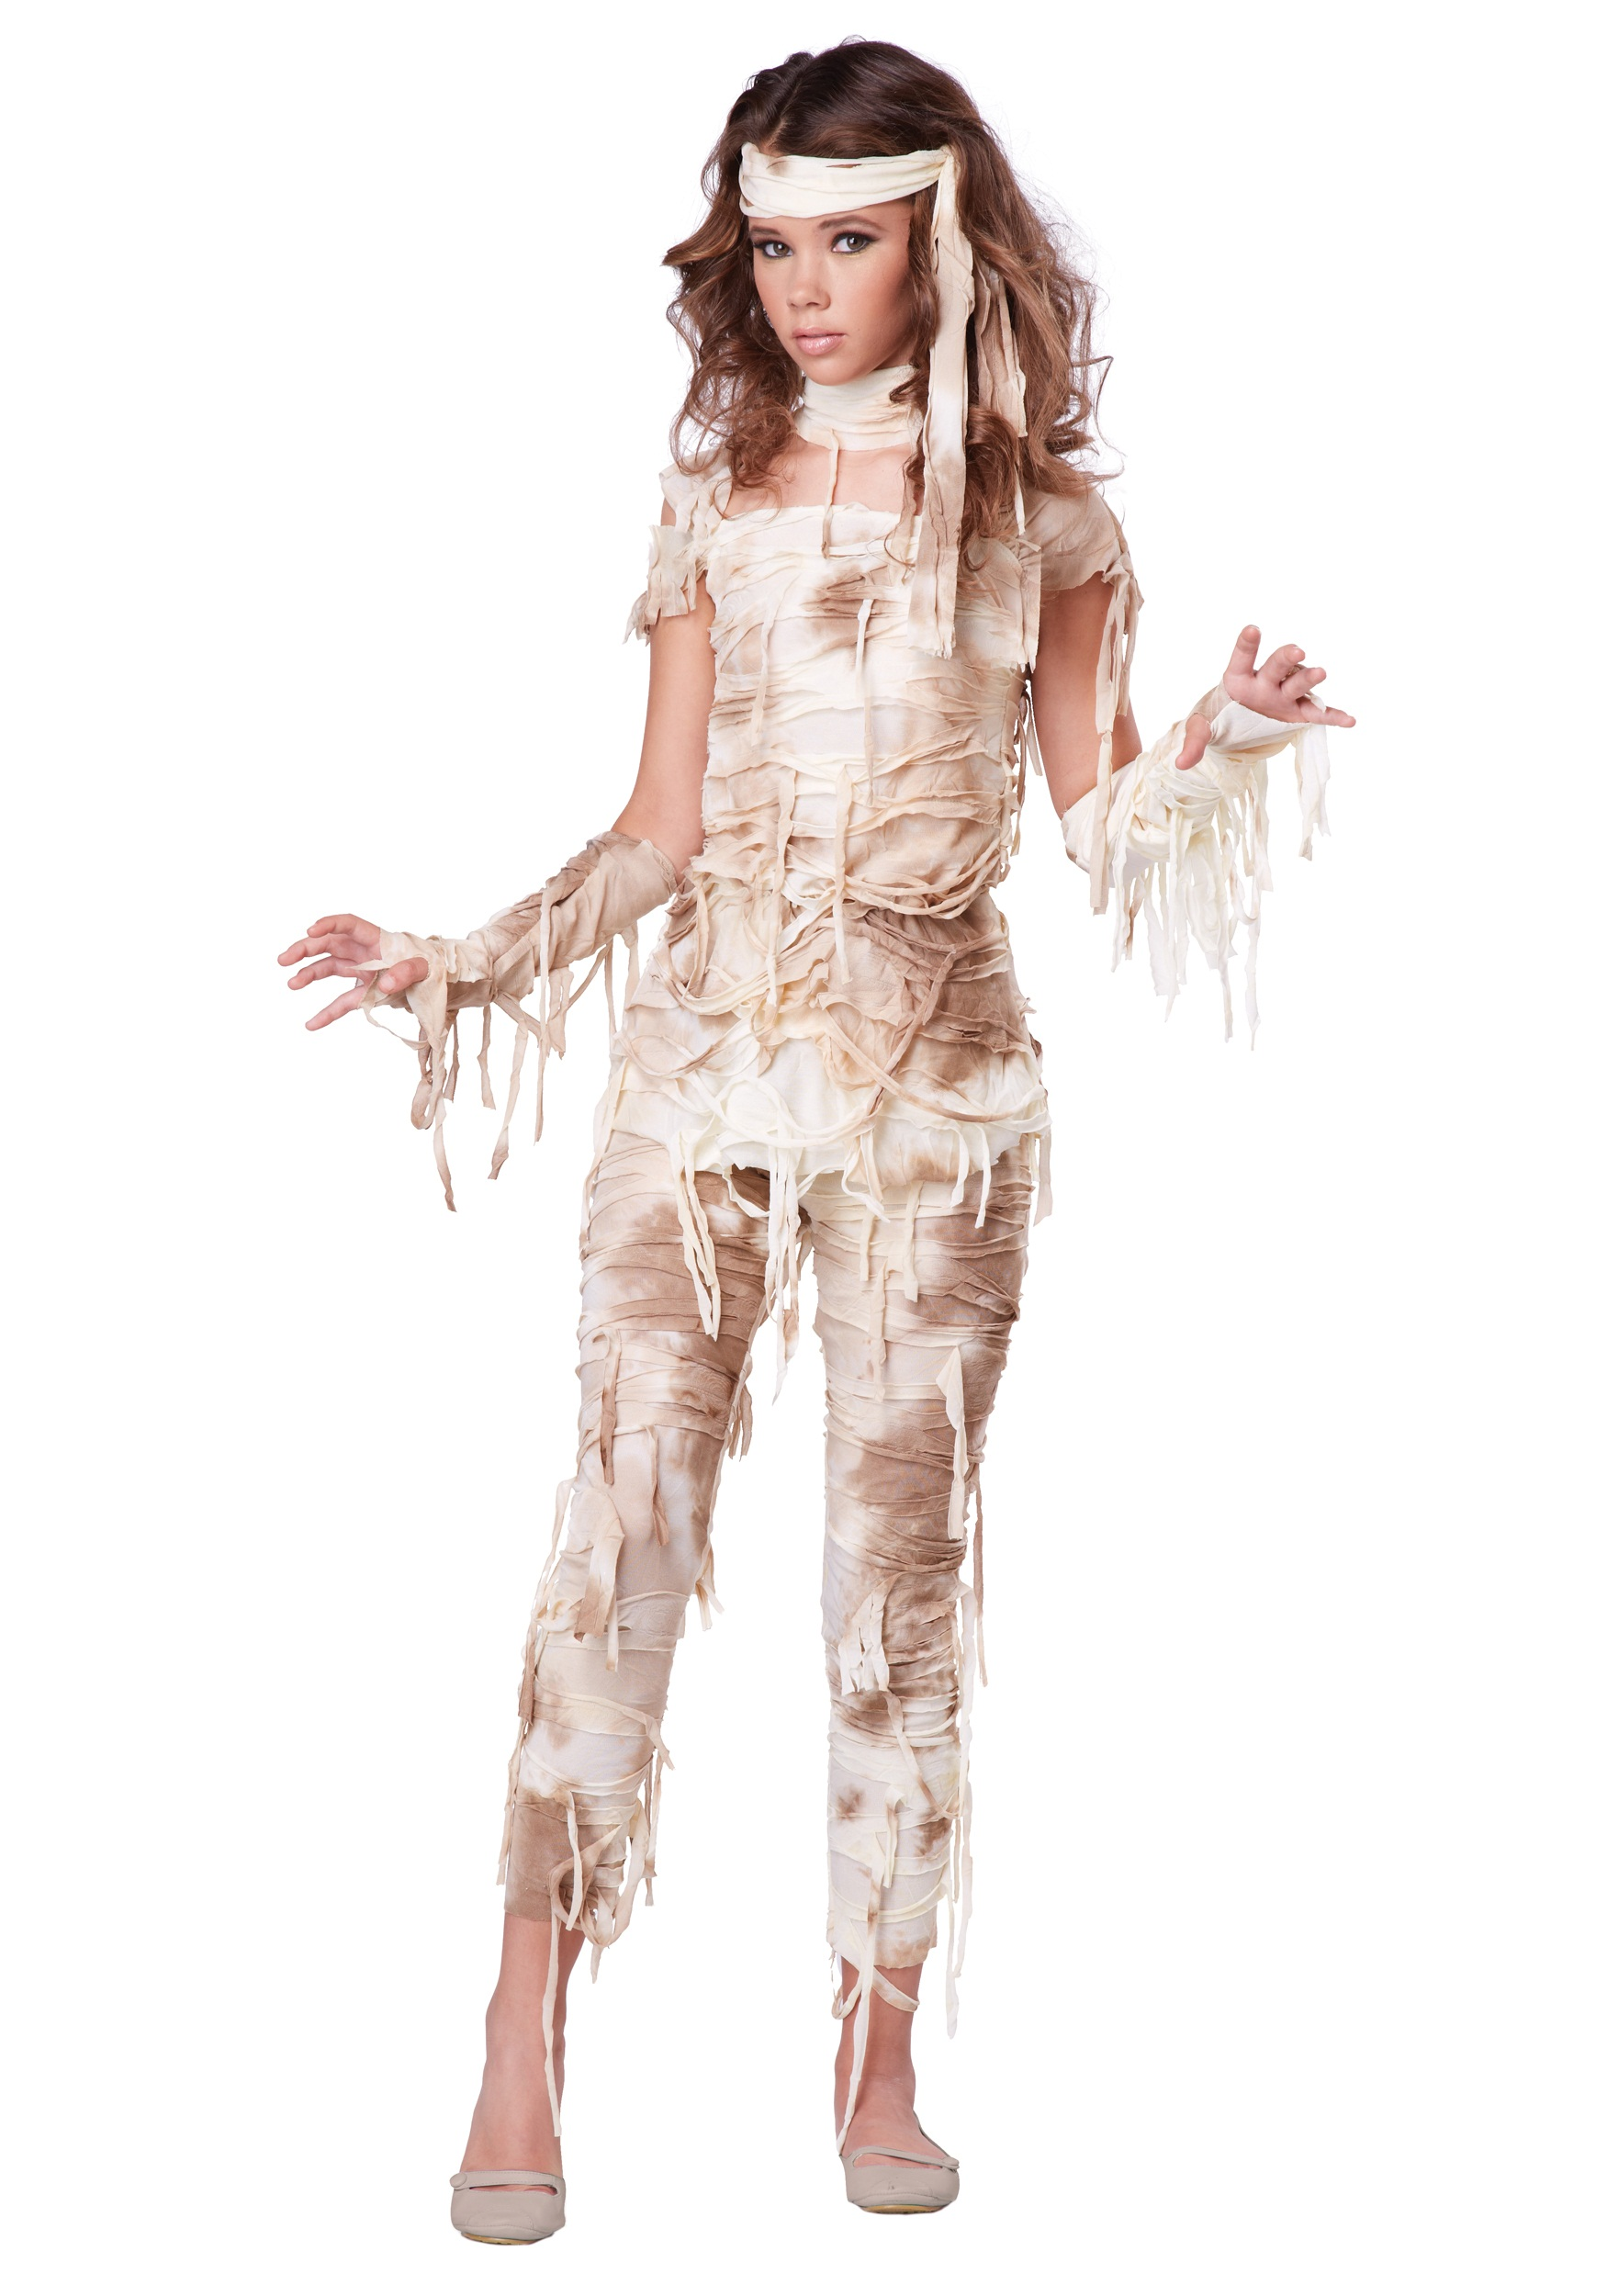 Teenage Halloween Costume Ideas For Girls.Mysterious Mummy Girls Teen Halloween Costume